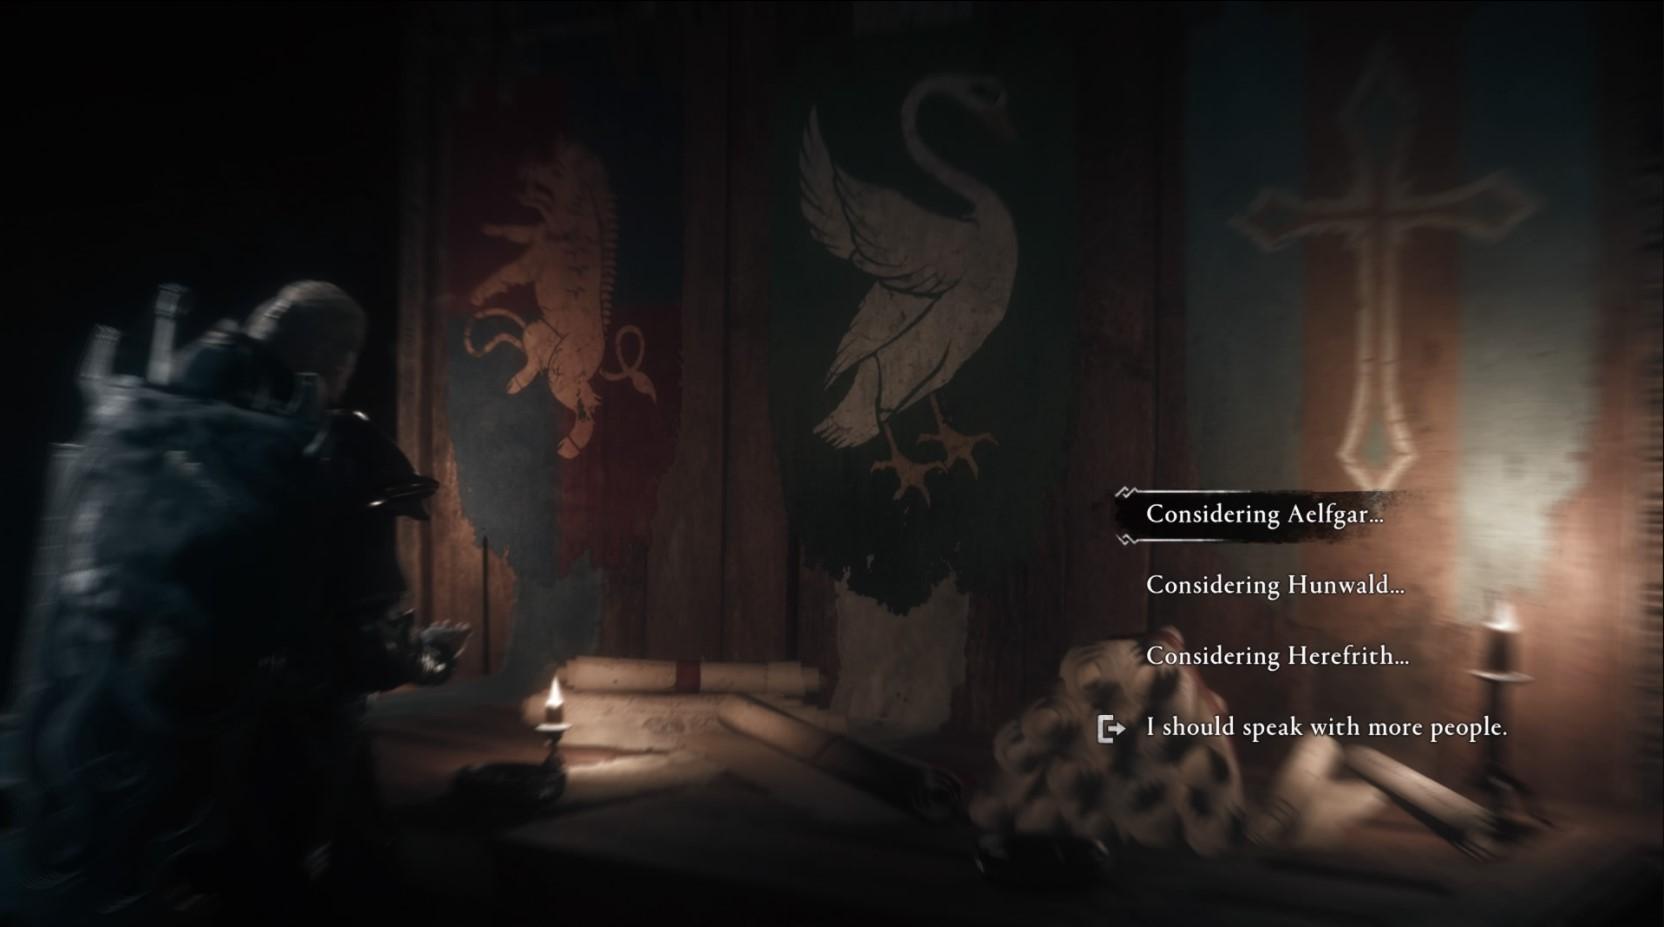 assassins creed valhalla lincolnscire ealdorman hunwald aelfgar herefrith